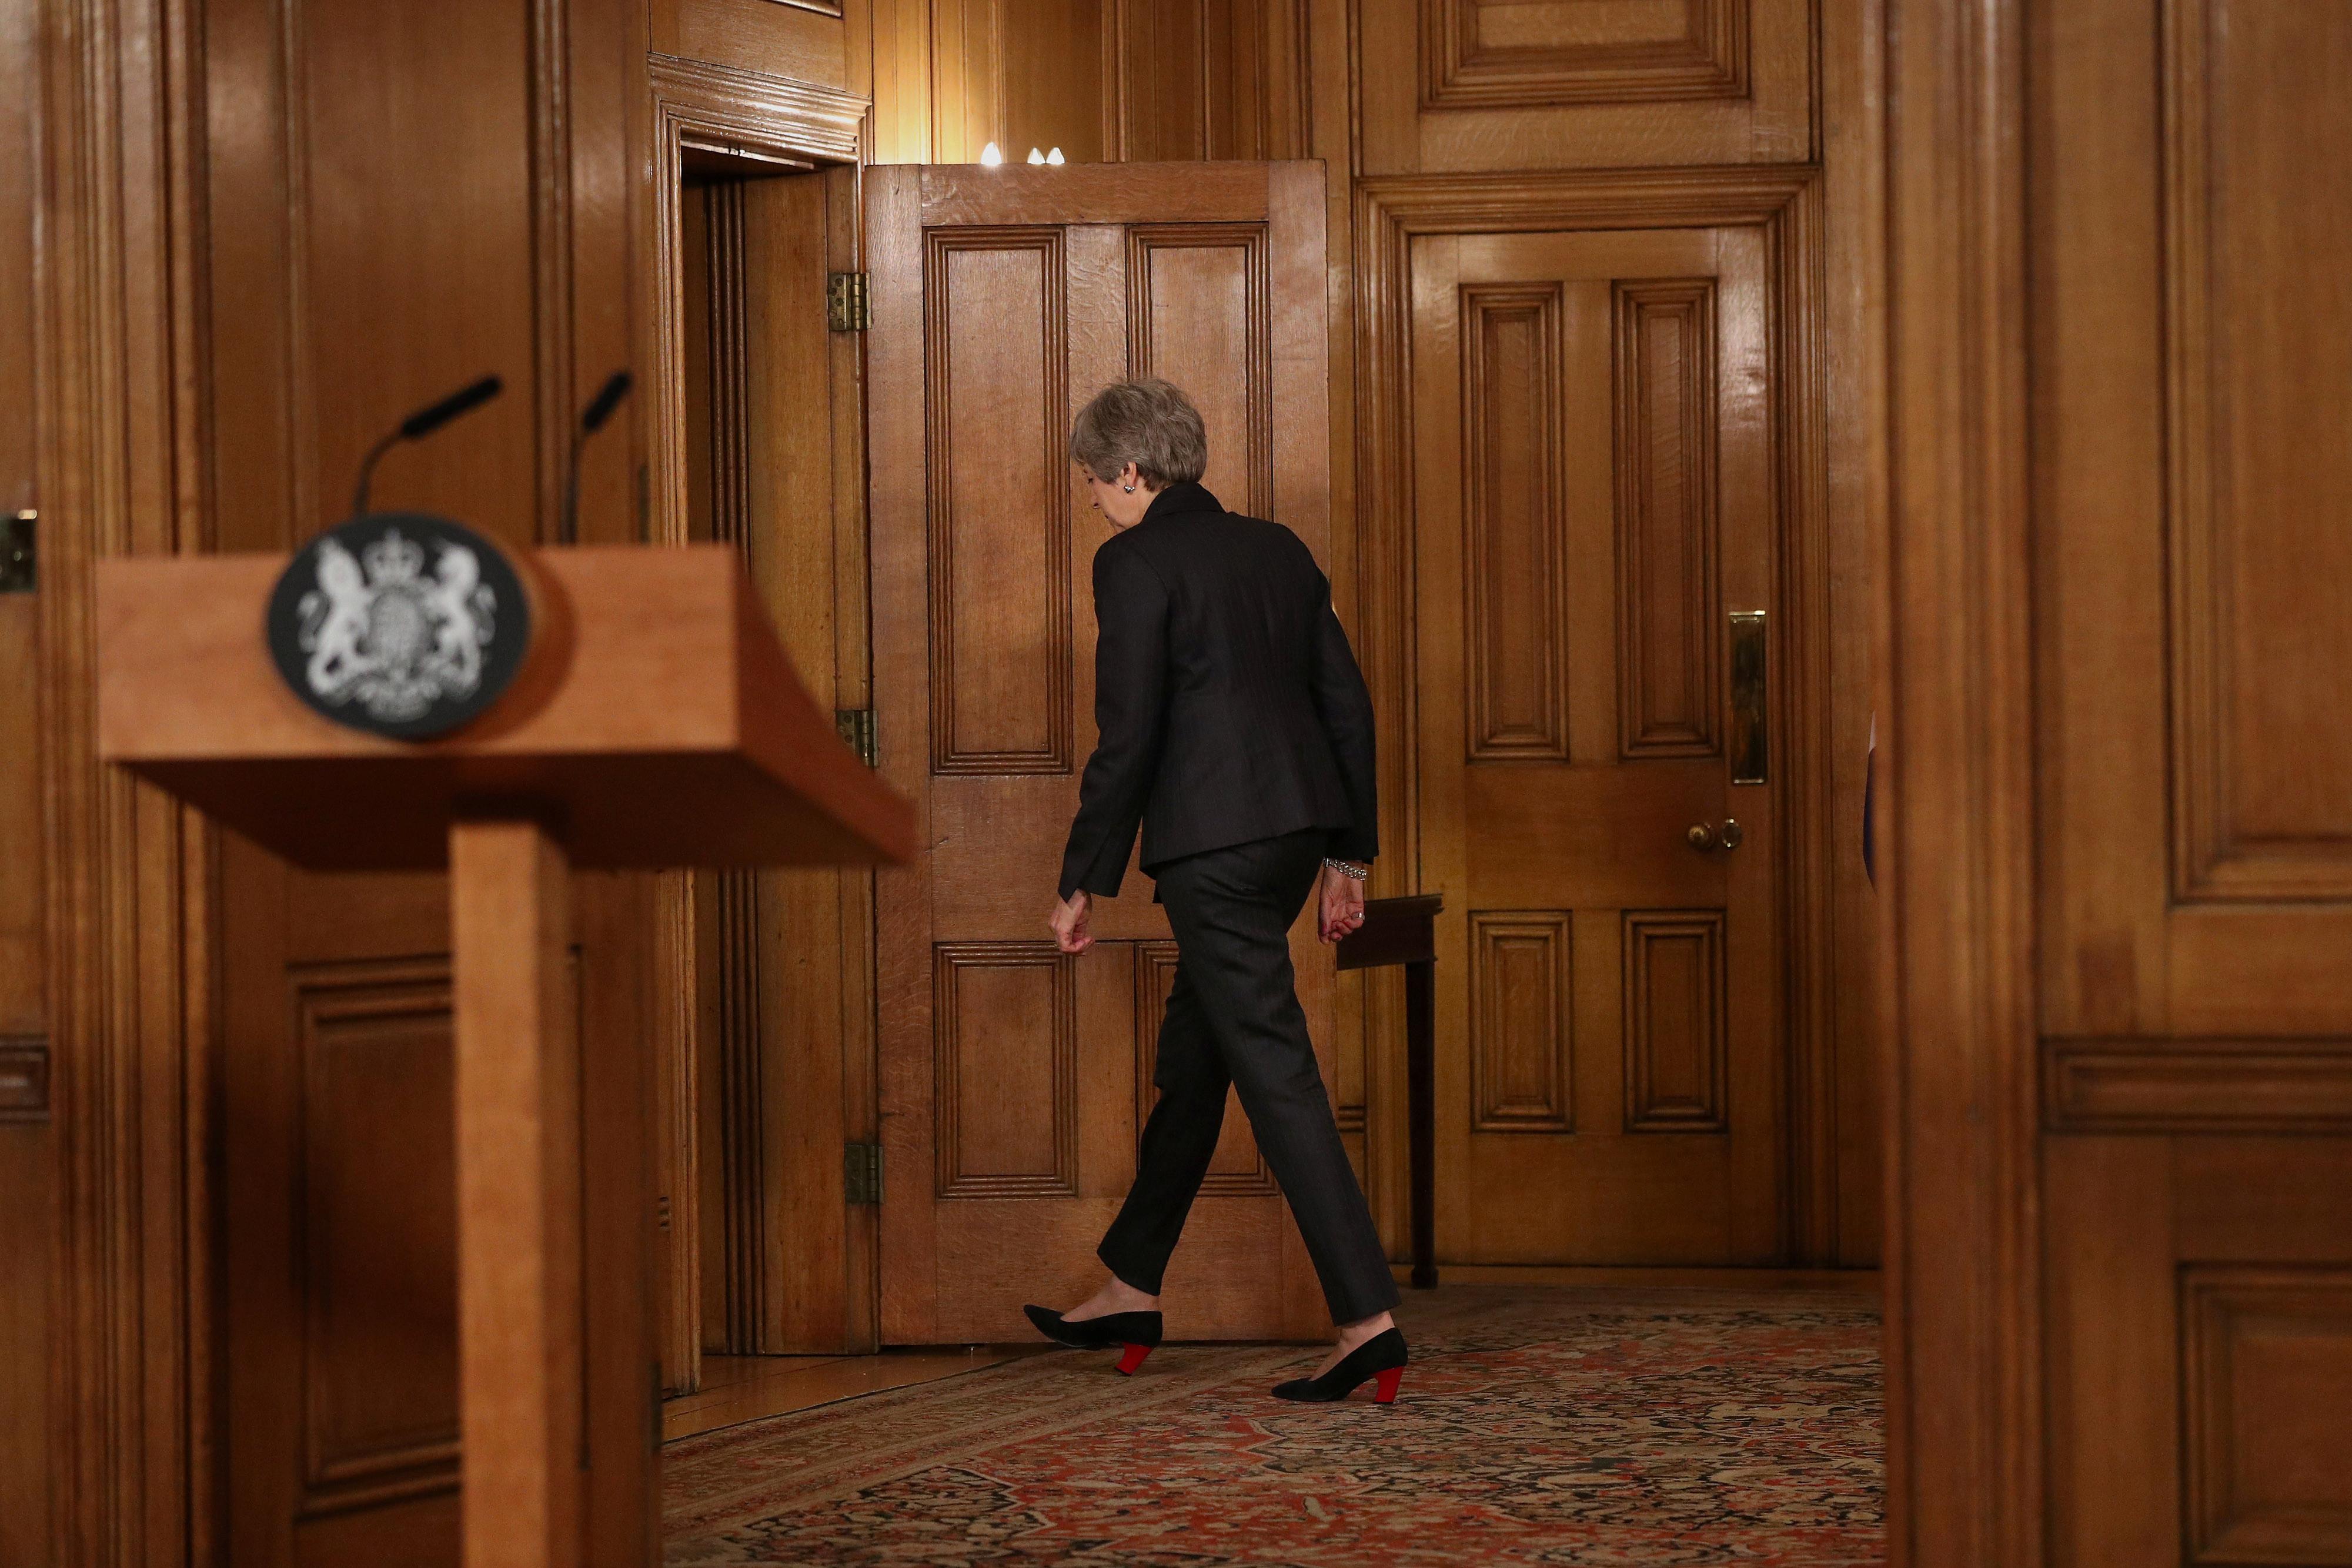 Desabafo ouvido na sala no final do discurso de May torna-se viral